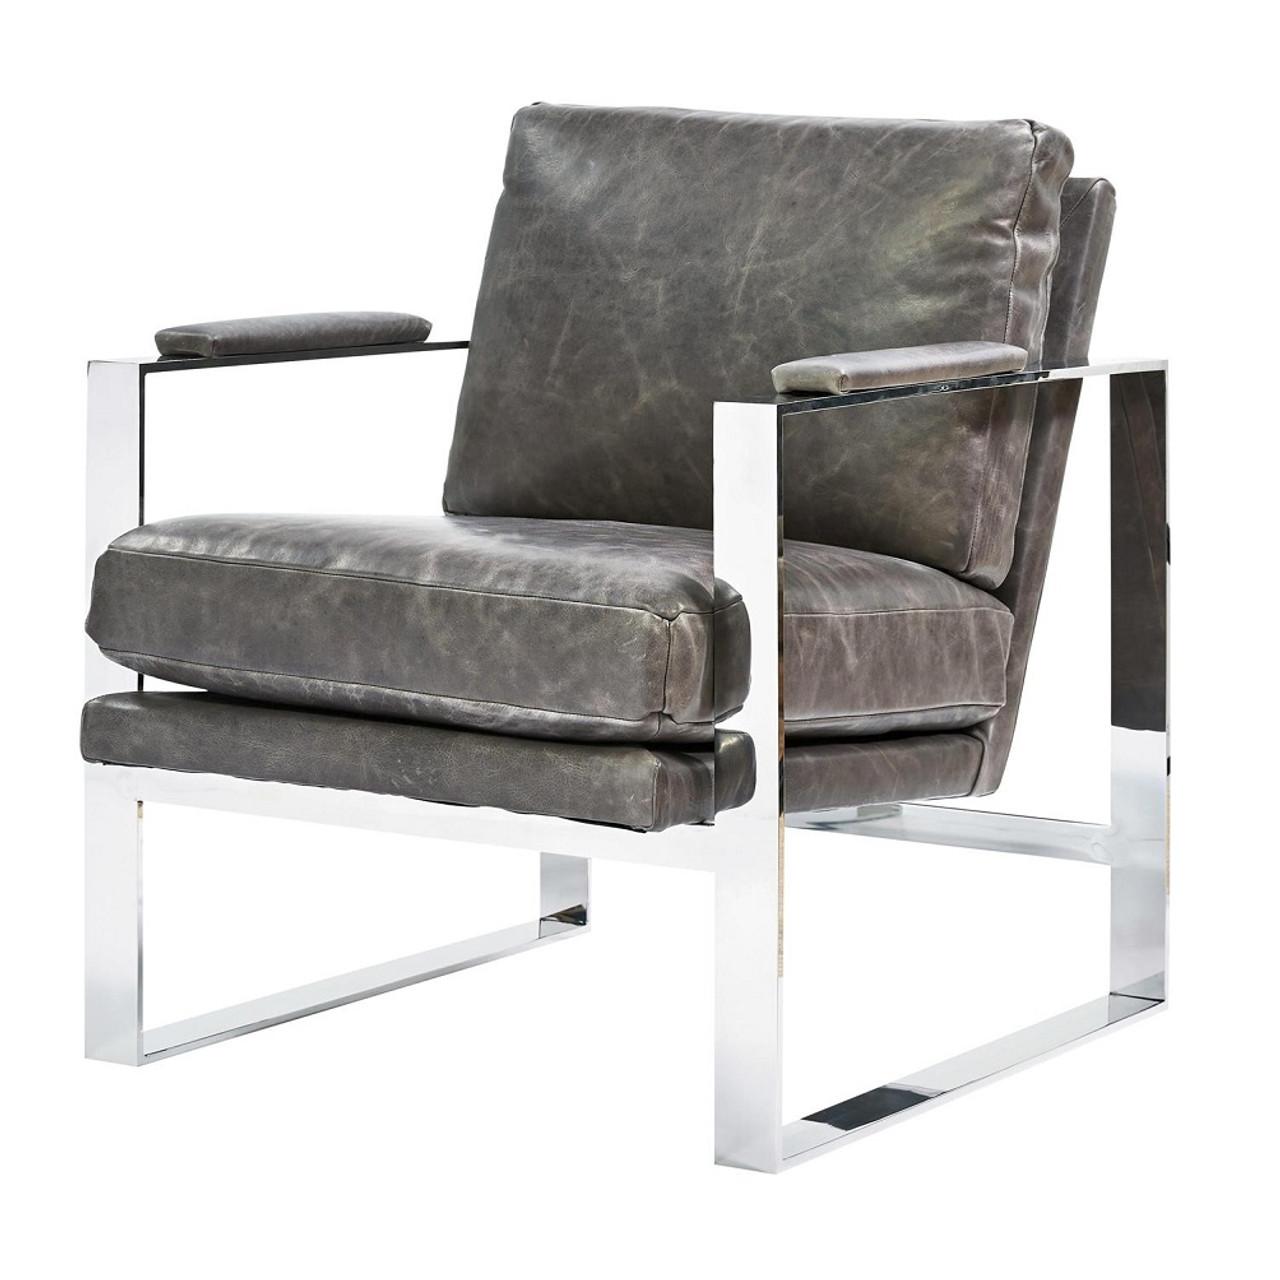 Super Elan Mid Century Modern Grey Leather Metal Arm Chair Lamtechconsult Wood Chair Design Ideas Lamtechconsultcom